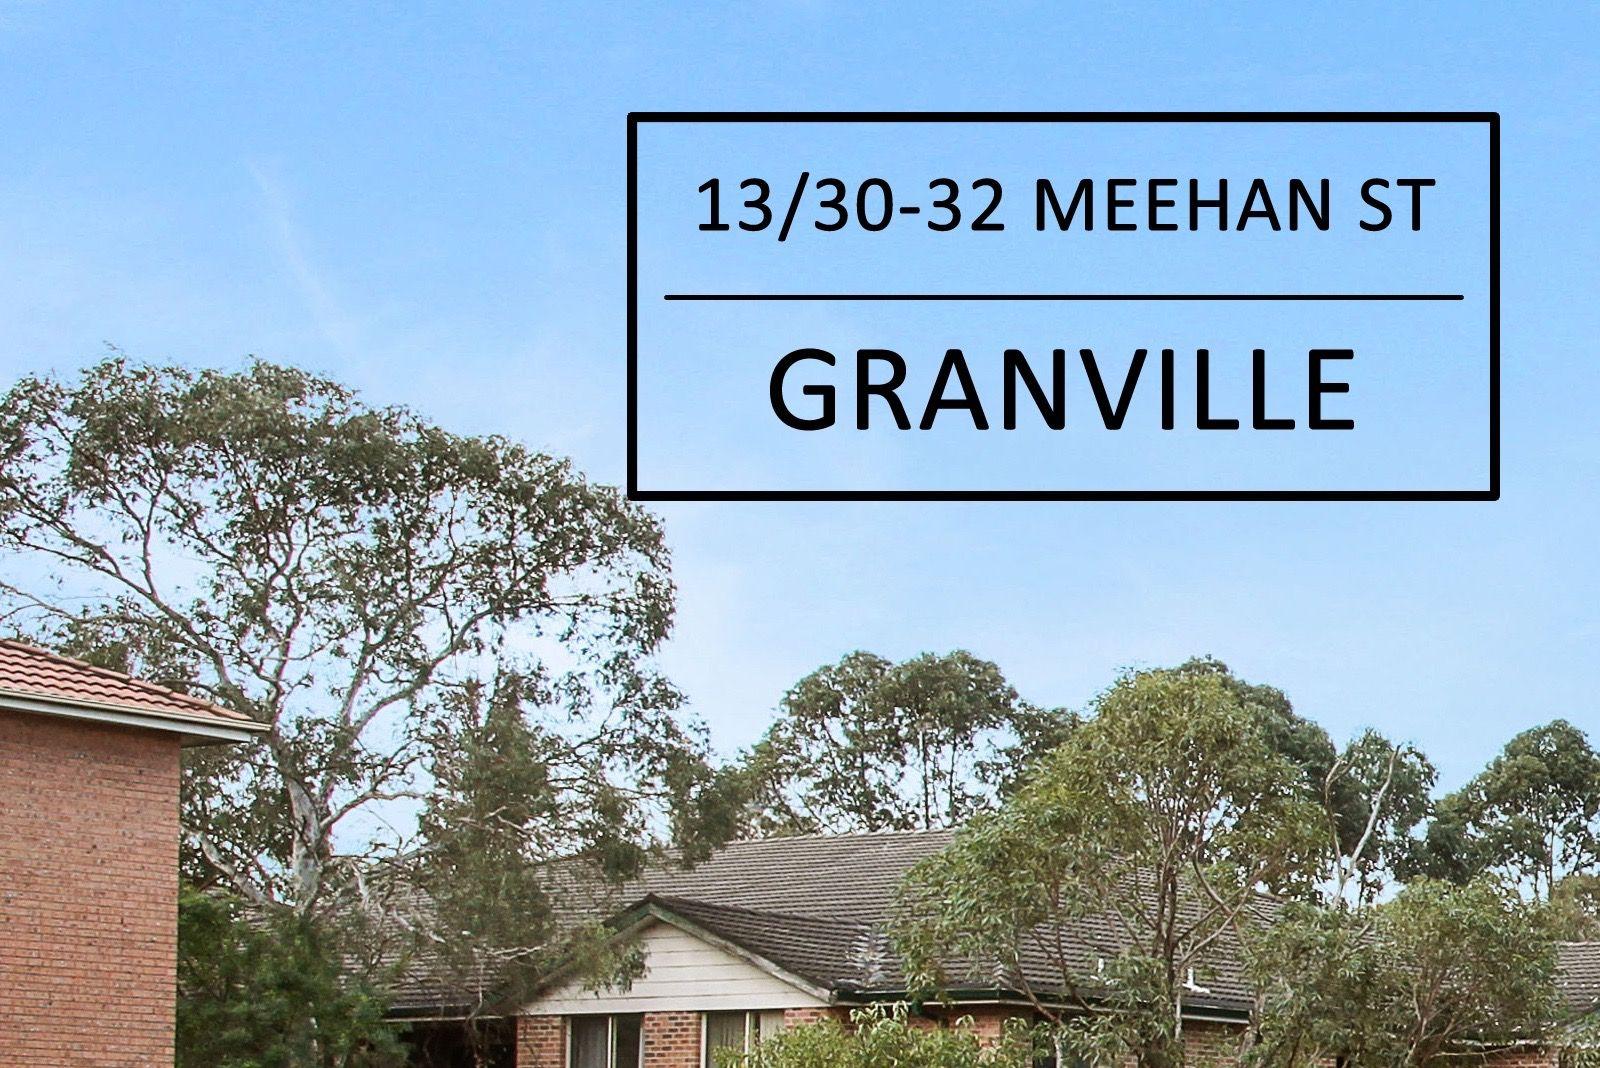 13/30-32 Meehan Street, Granville NSW 2142, Image 0